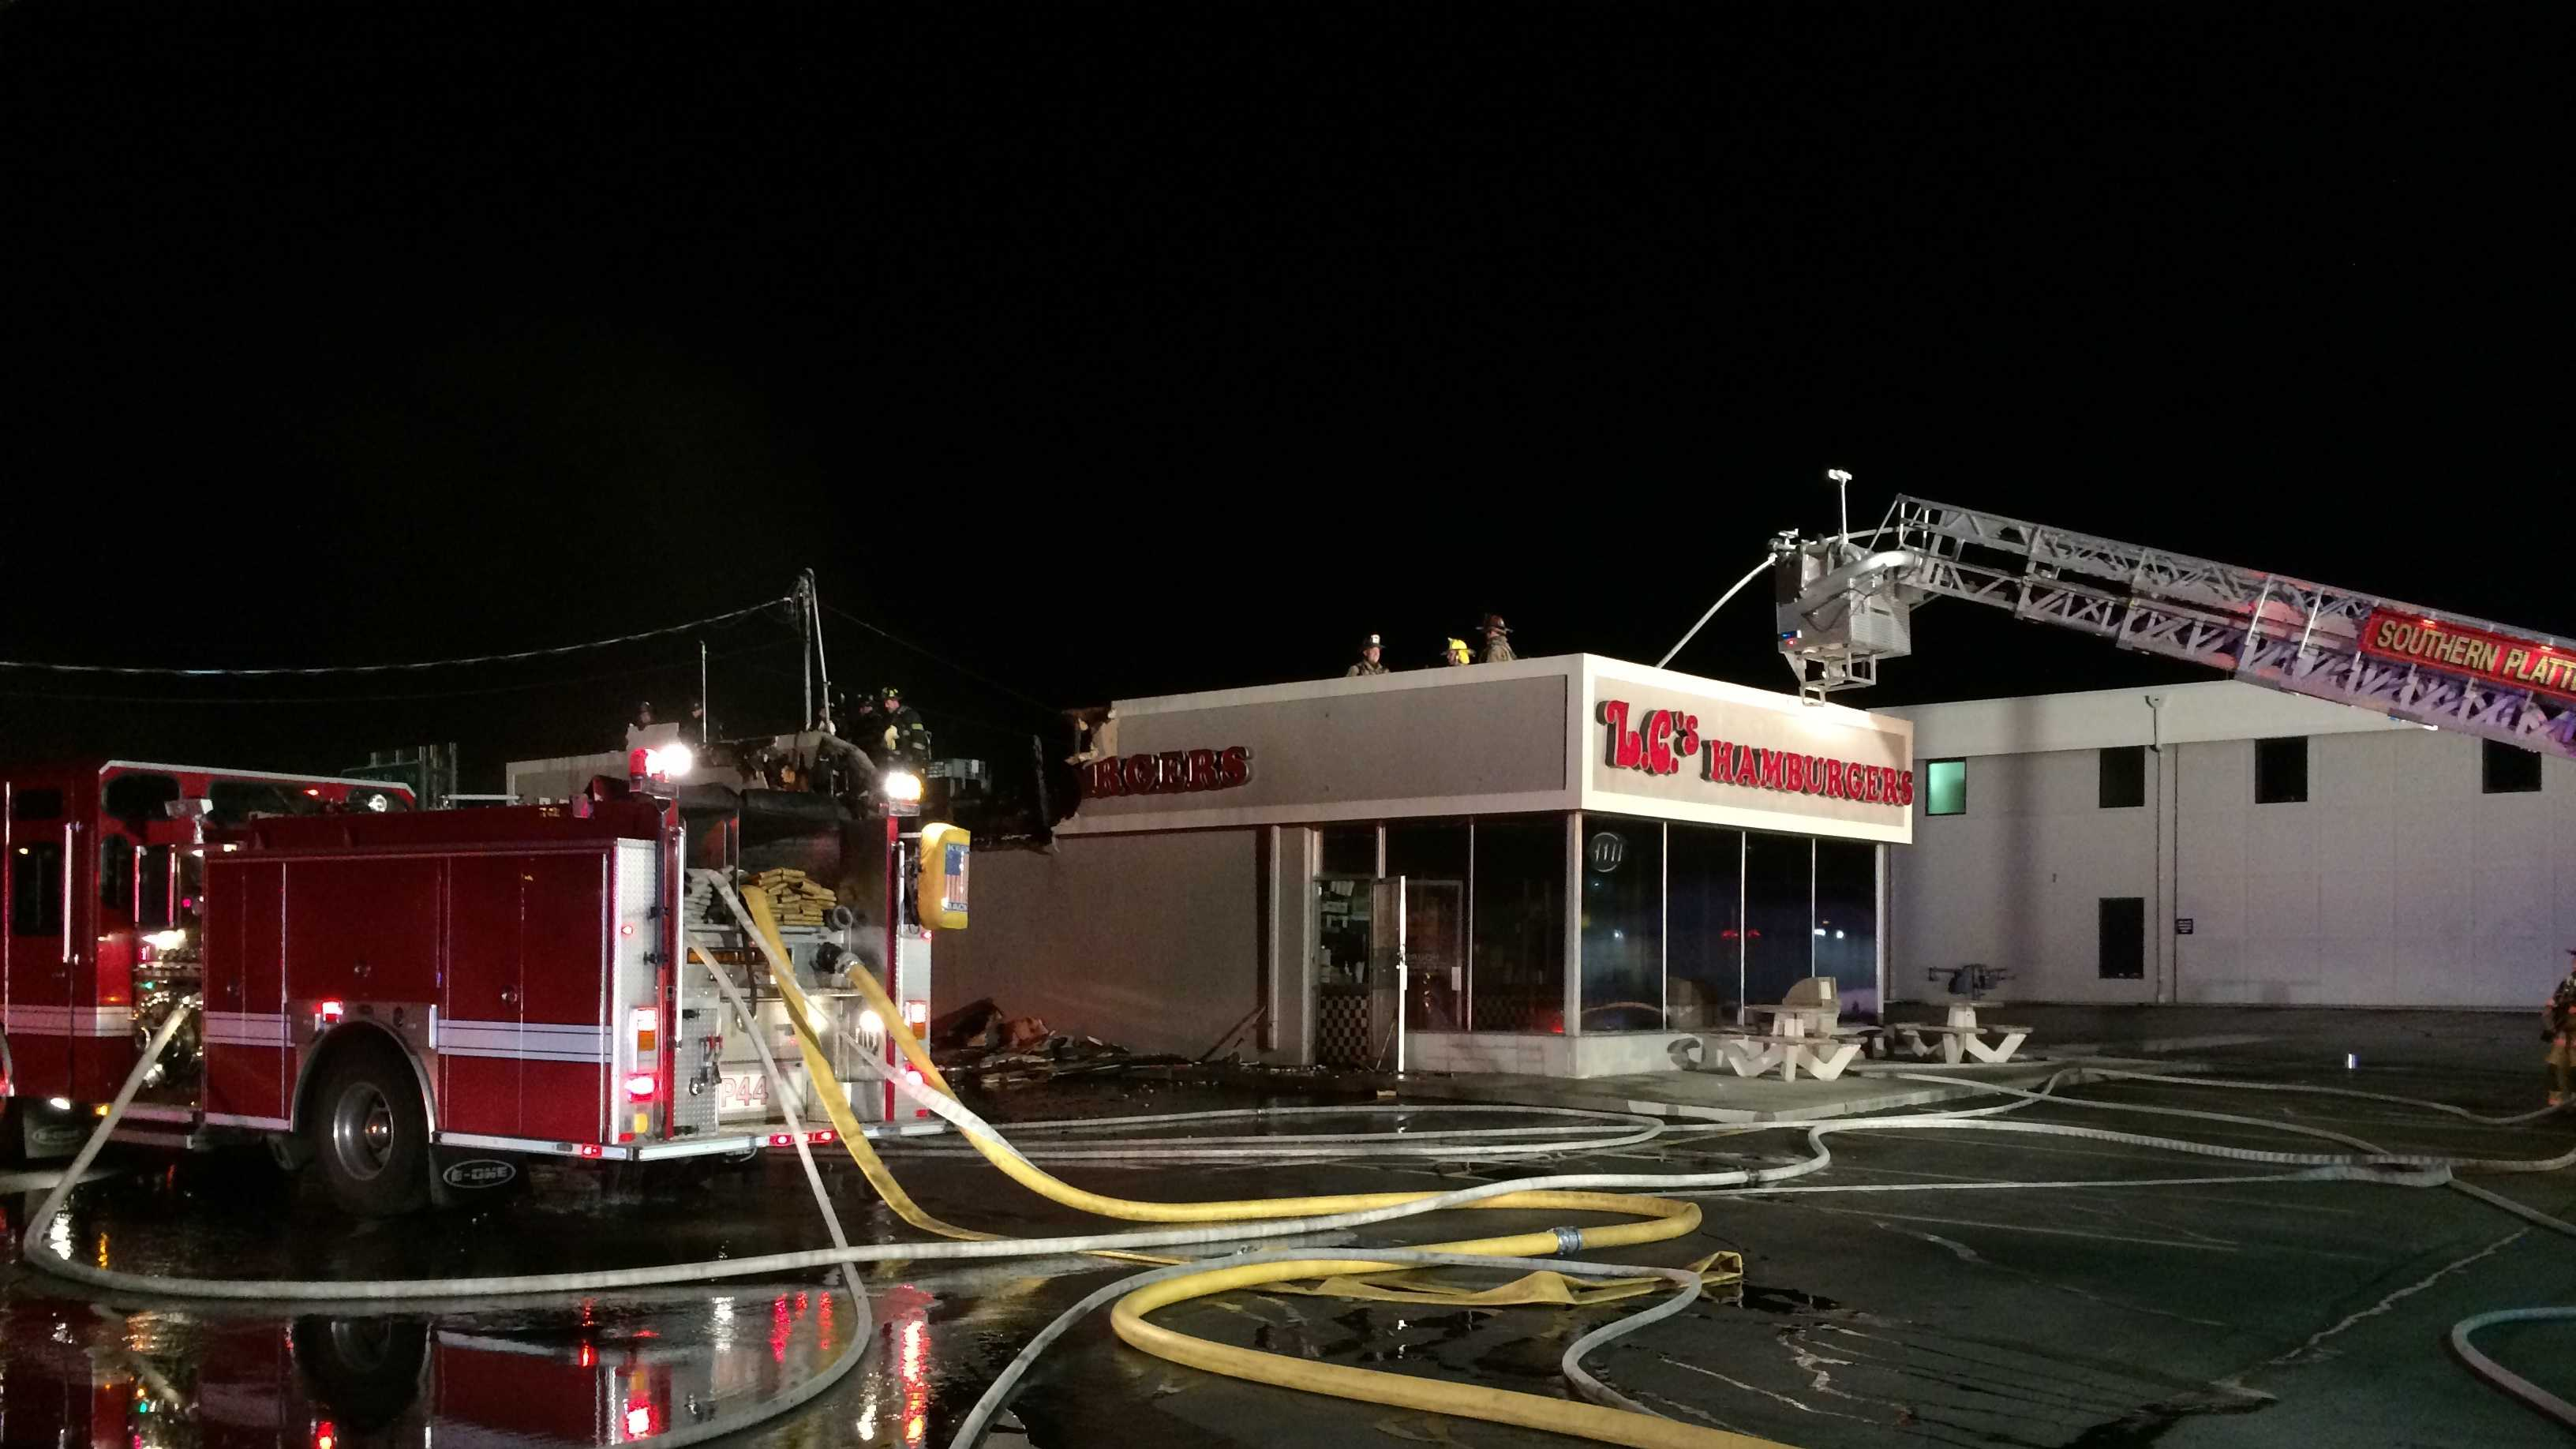 LC's Hamburgers fire